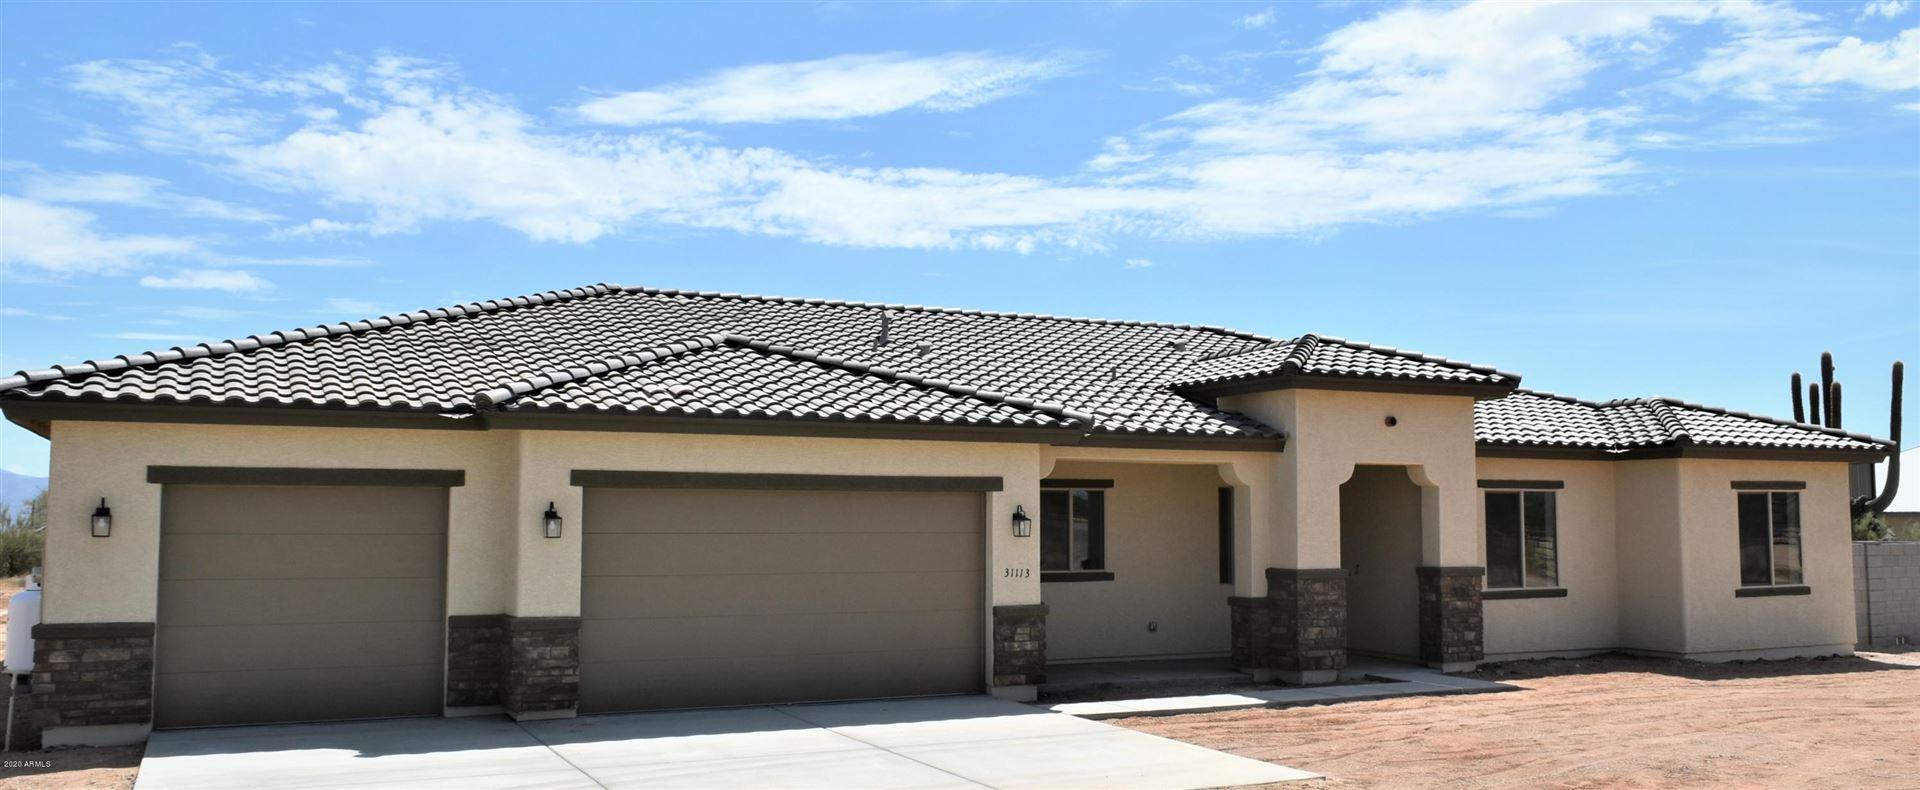 825 E Perdido Way, Phoenix, AZ 85086 - MLS#: 6106391